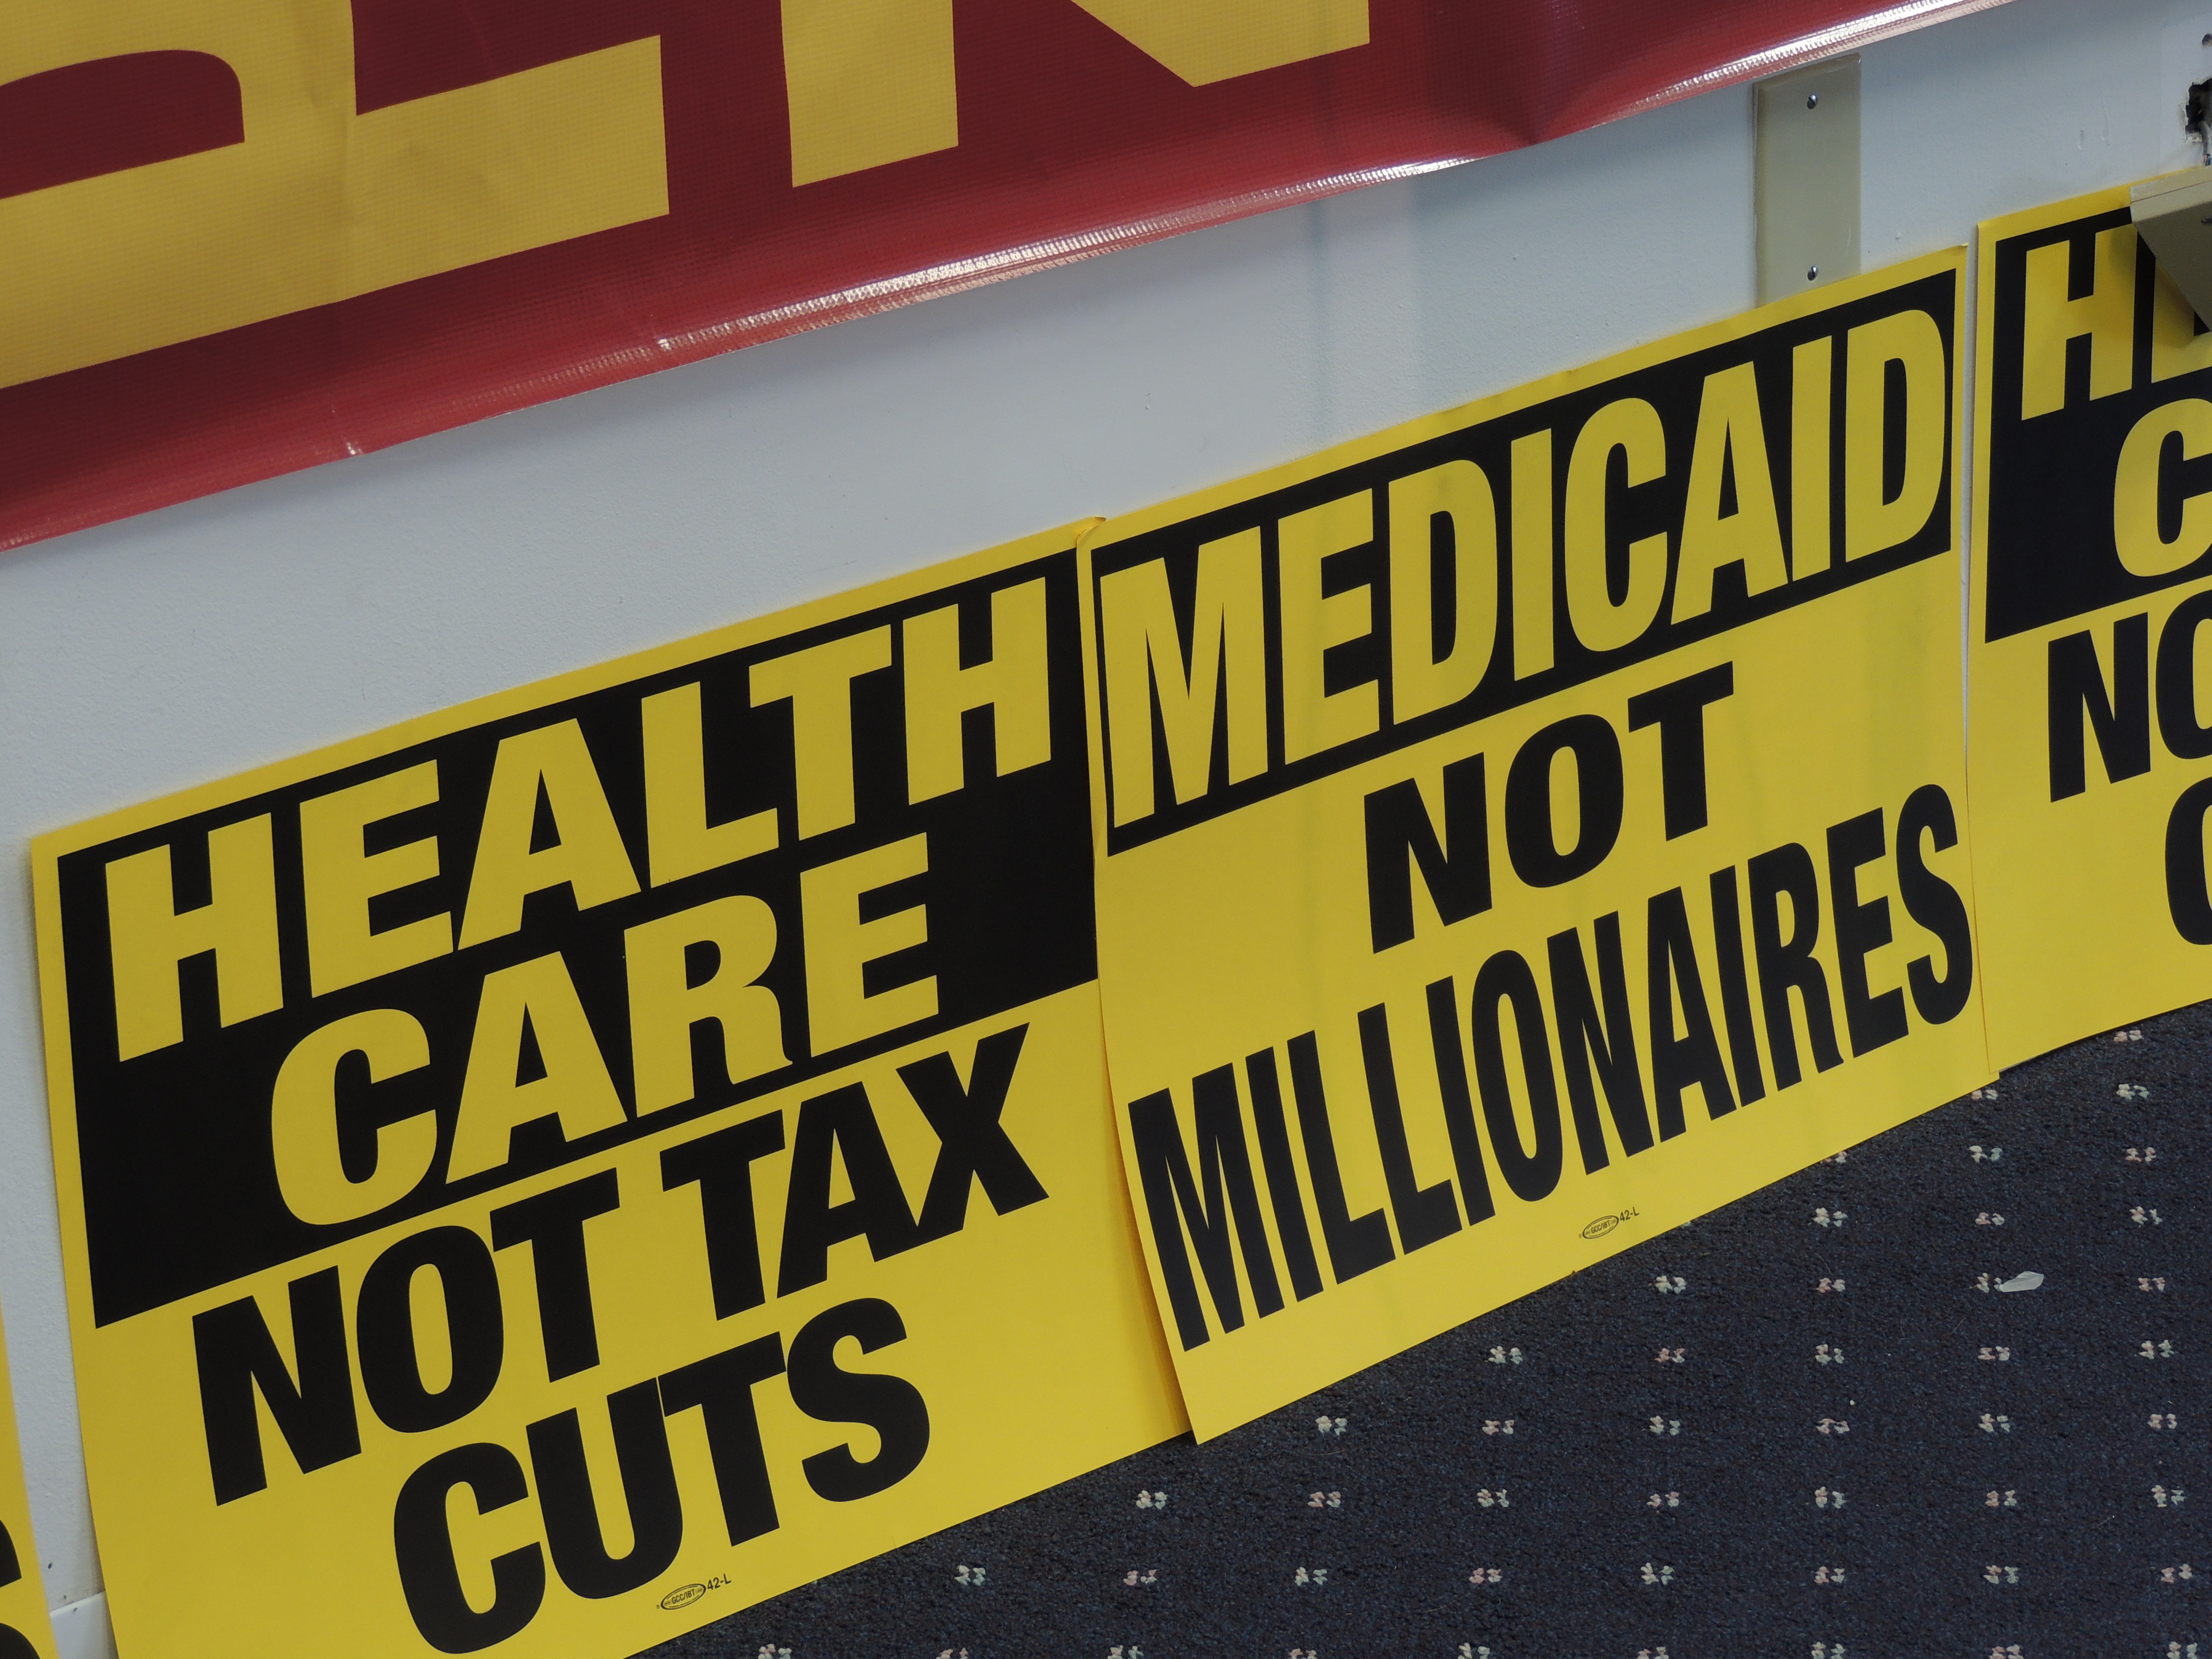 Health Care, not tax cuts. Medicaid, not millionaires. Trumpcare. AHCA. Senate healthcare bill